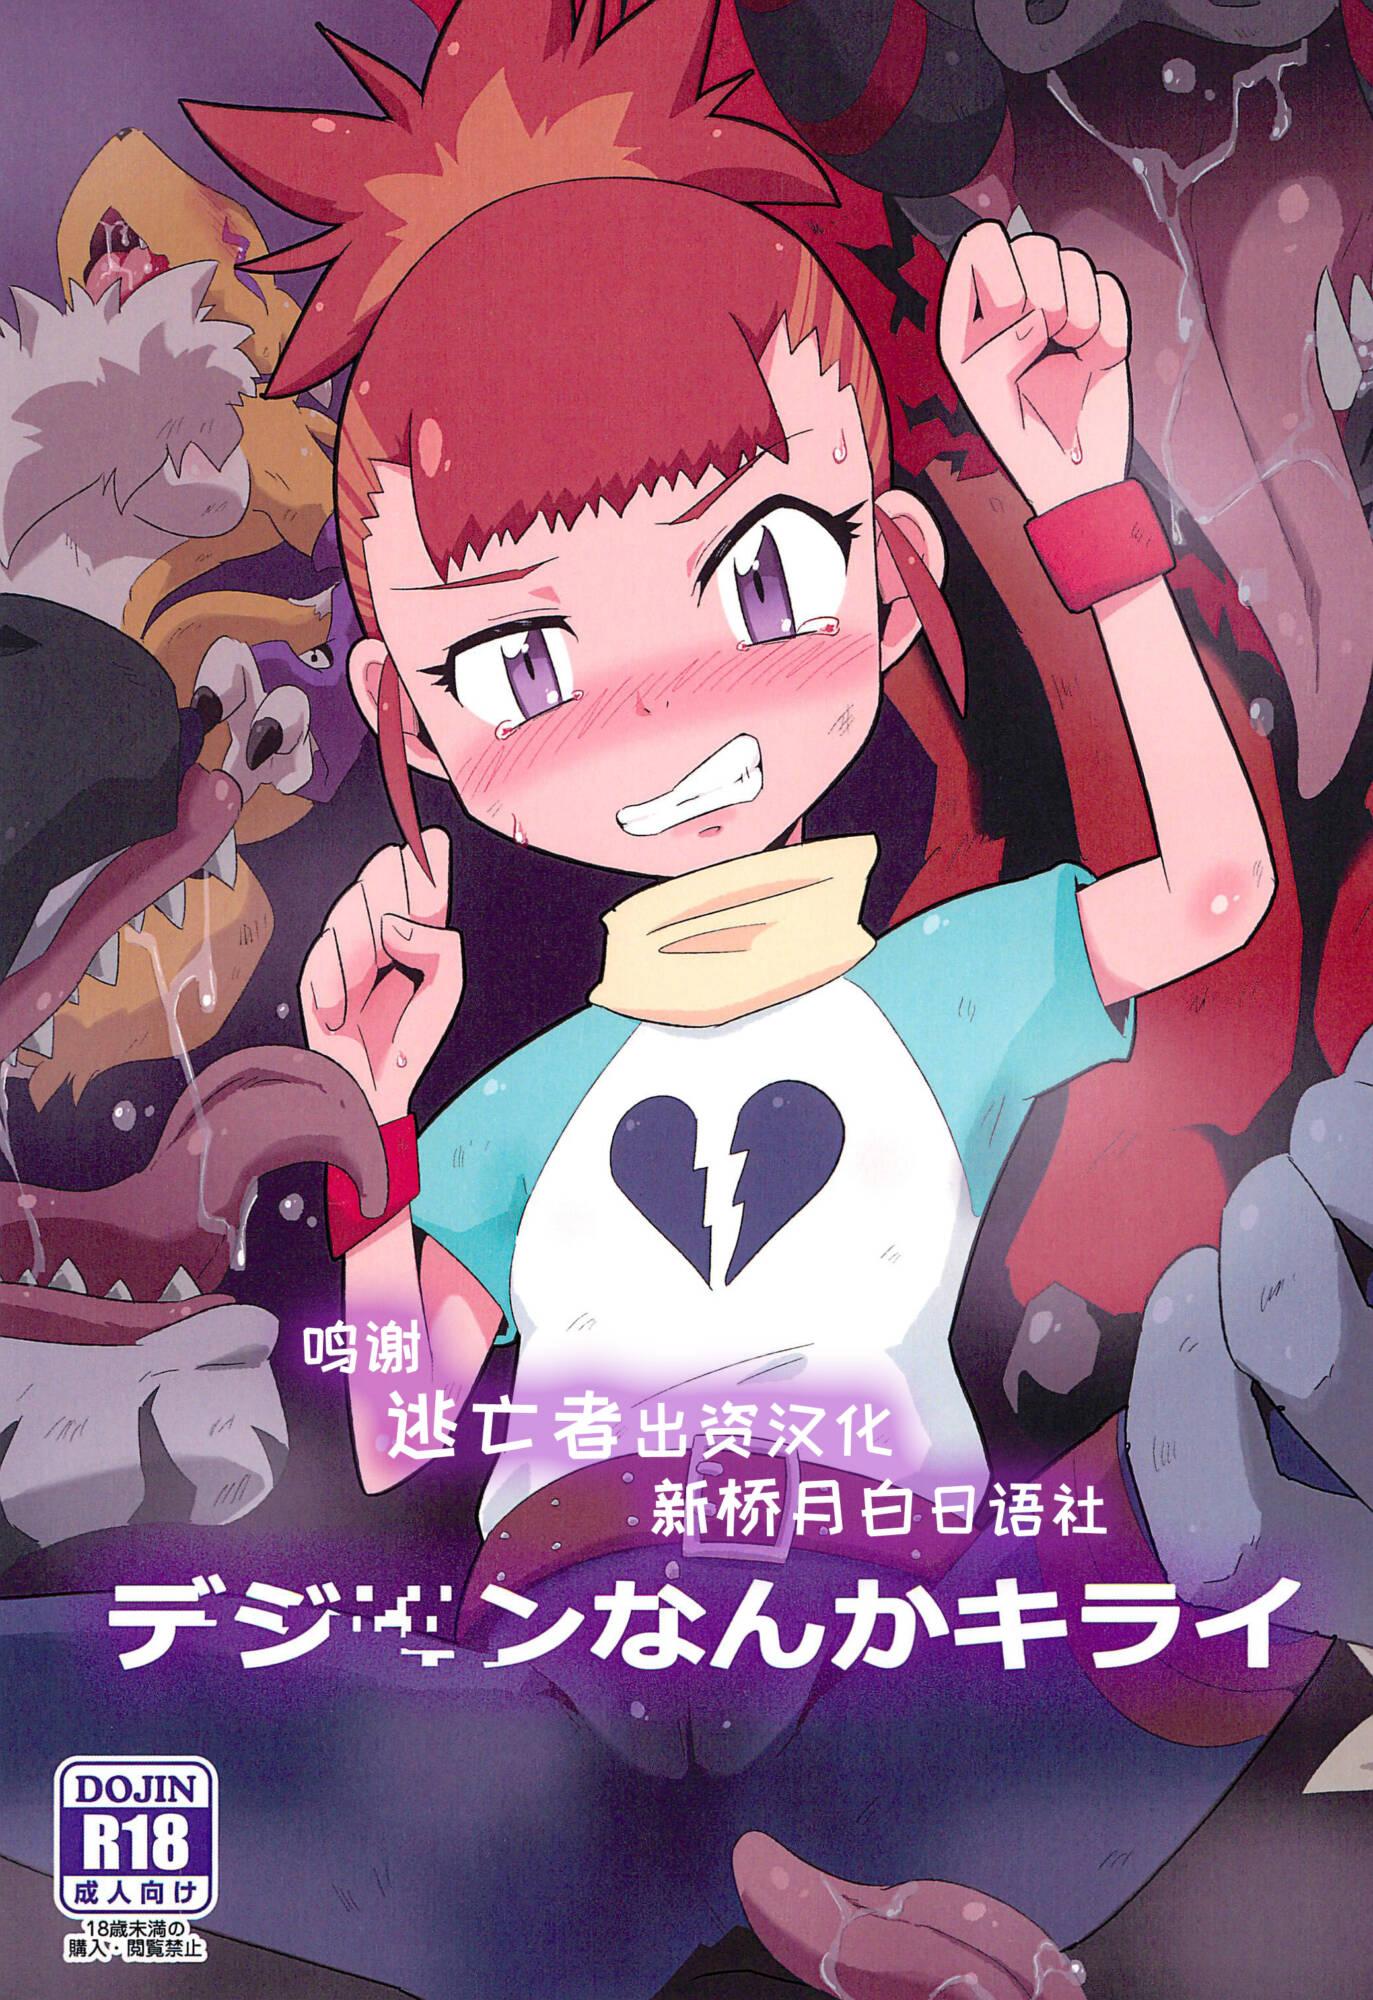 Digimon nanka Kirai (Chinese) - page00a Cover Digimon Adventure,  xxx porn rule34